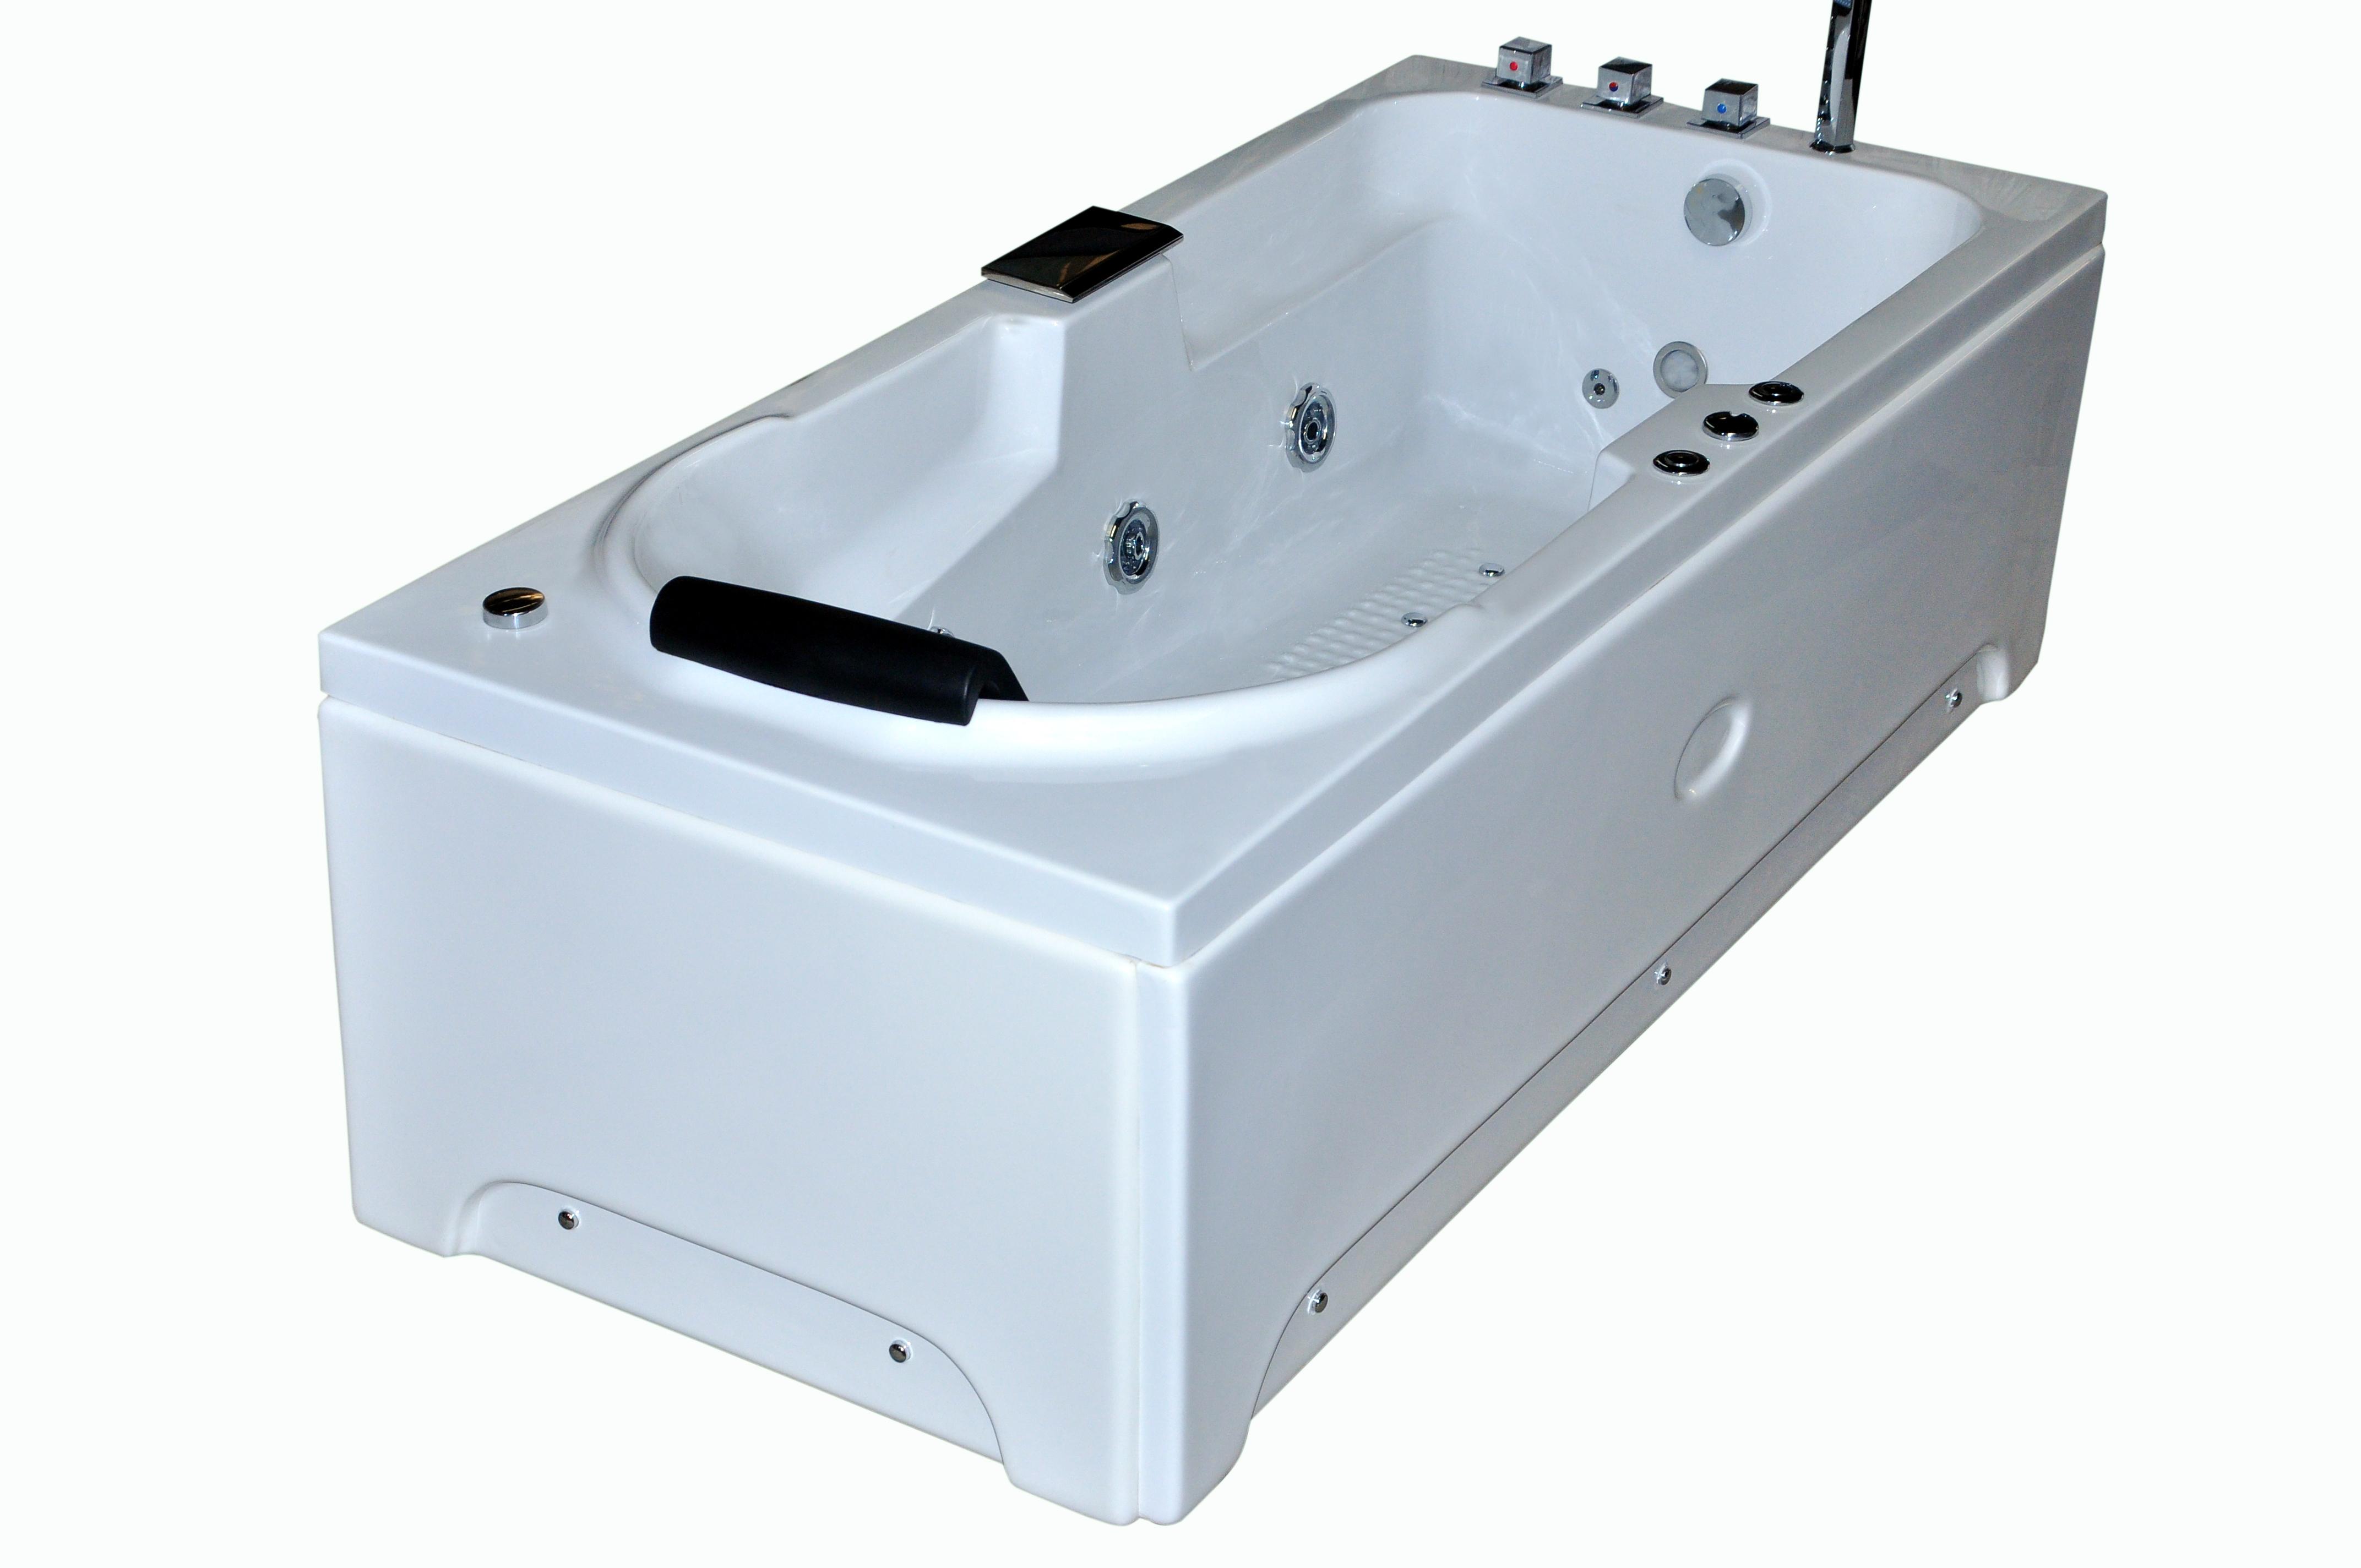 VBL-005 Jacuzzi Bathtub